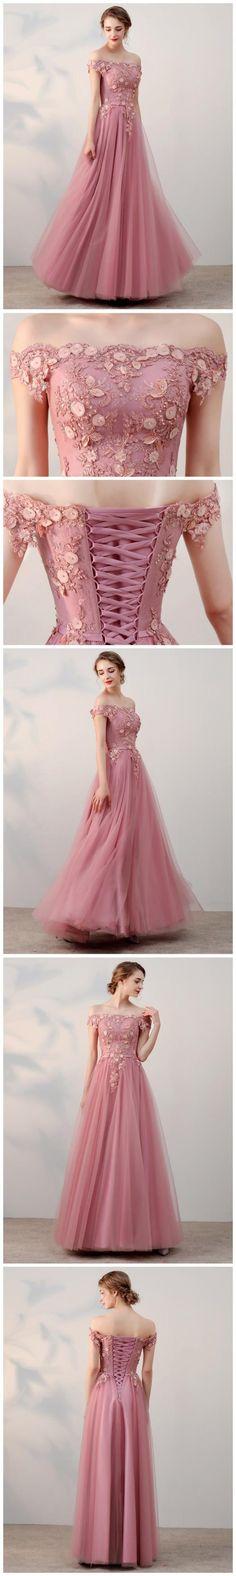 Chic A-line Off-the-shoulder pink Applique Tulle Modest Long Prom Dress Evening Dress from aimidress - 2020 New Prom Dresses Fashion - Fashion Of The Year Formal Dresses For Women, Elegant Dresses, Pretty Dresses, Beautiful Dresses, Dress Formal, Formal Gowns, Ball Gowns Prom, Ball Dresses, Homecoming Dresses